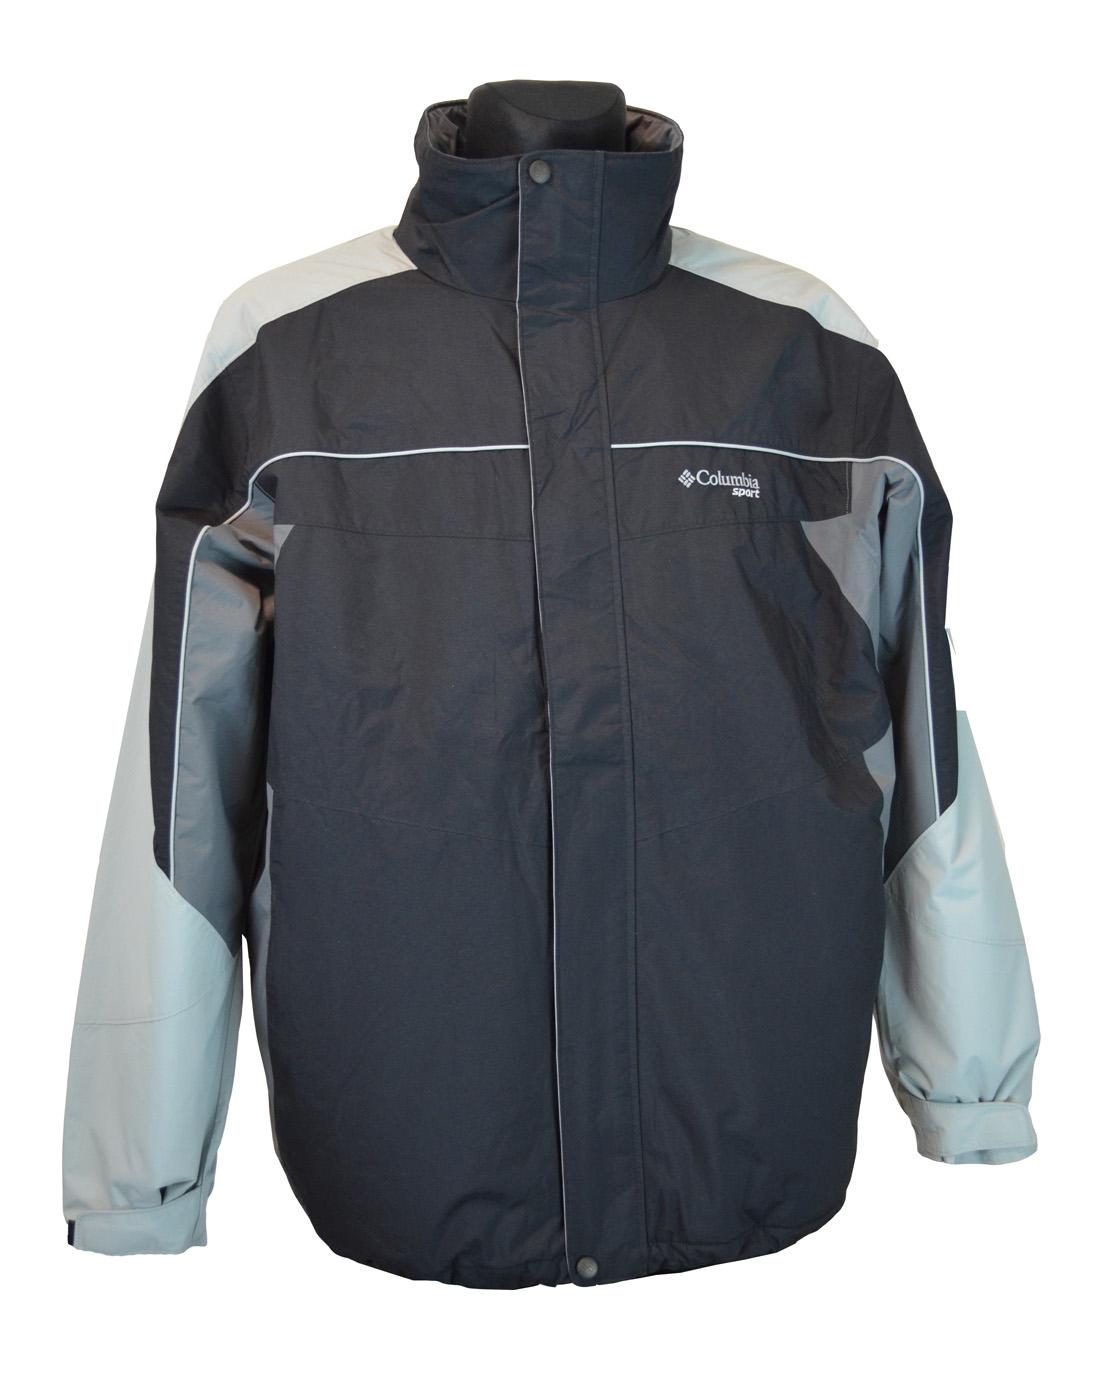 6c19fbe1 Columbia Киев - мужские куртки, пуховики Columbia Omni Heat купить в ...